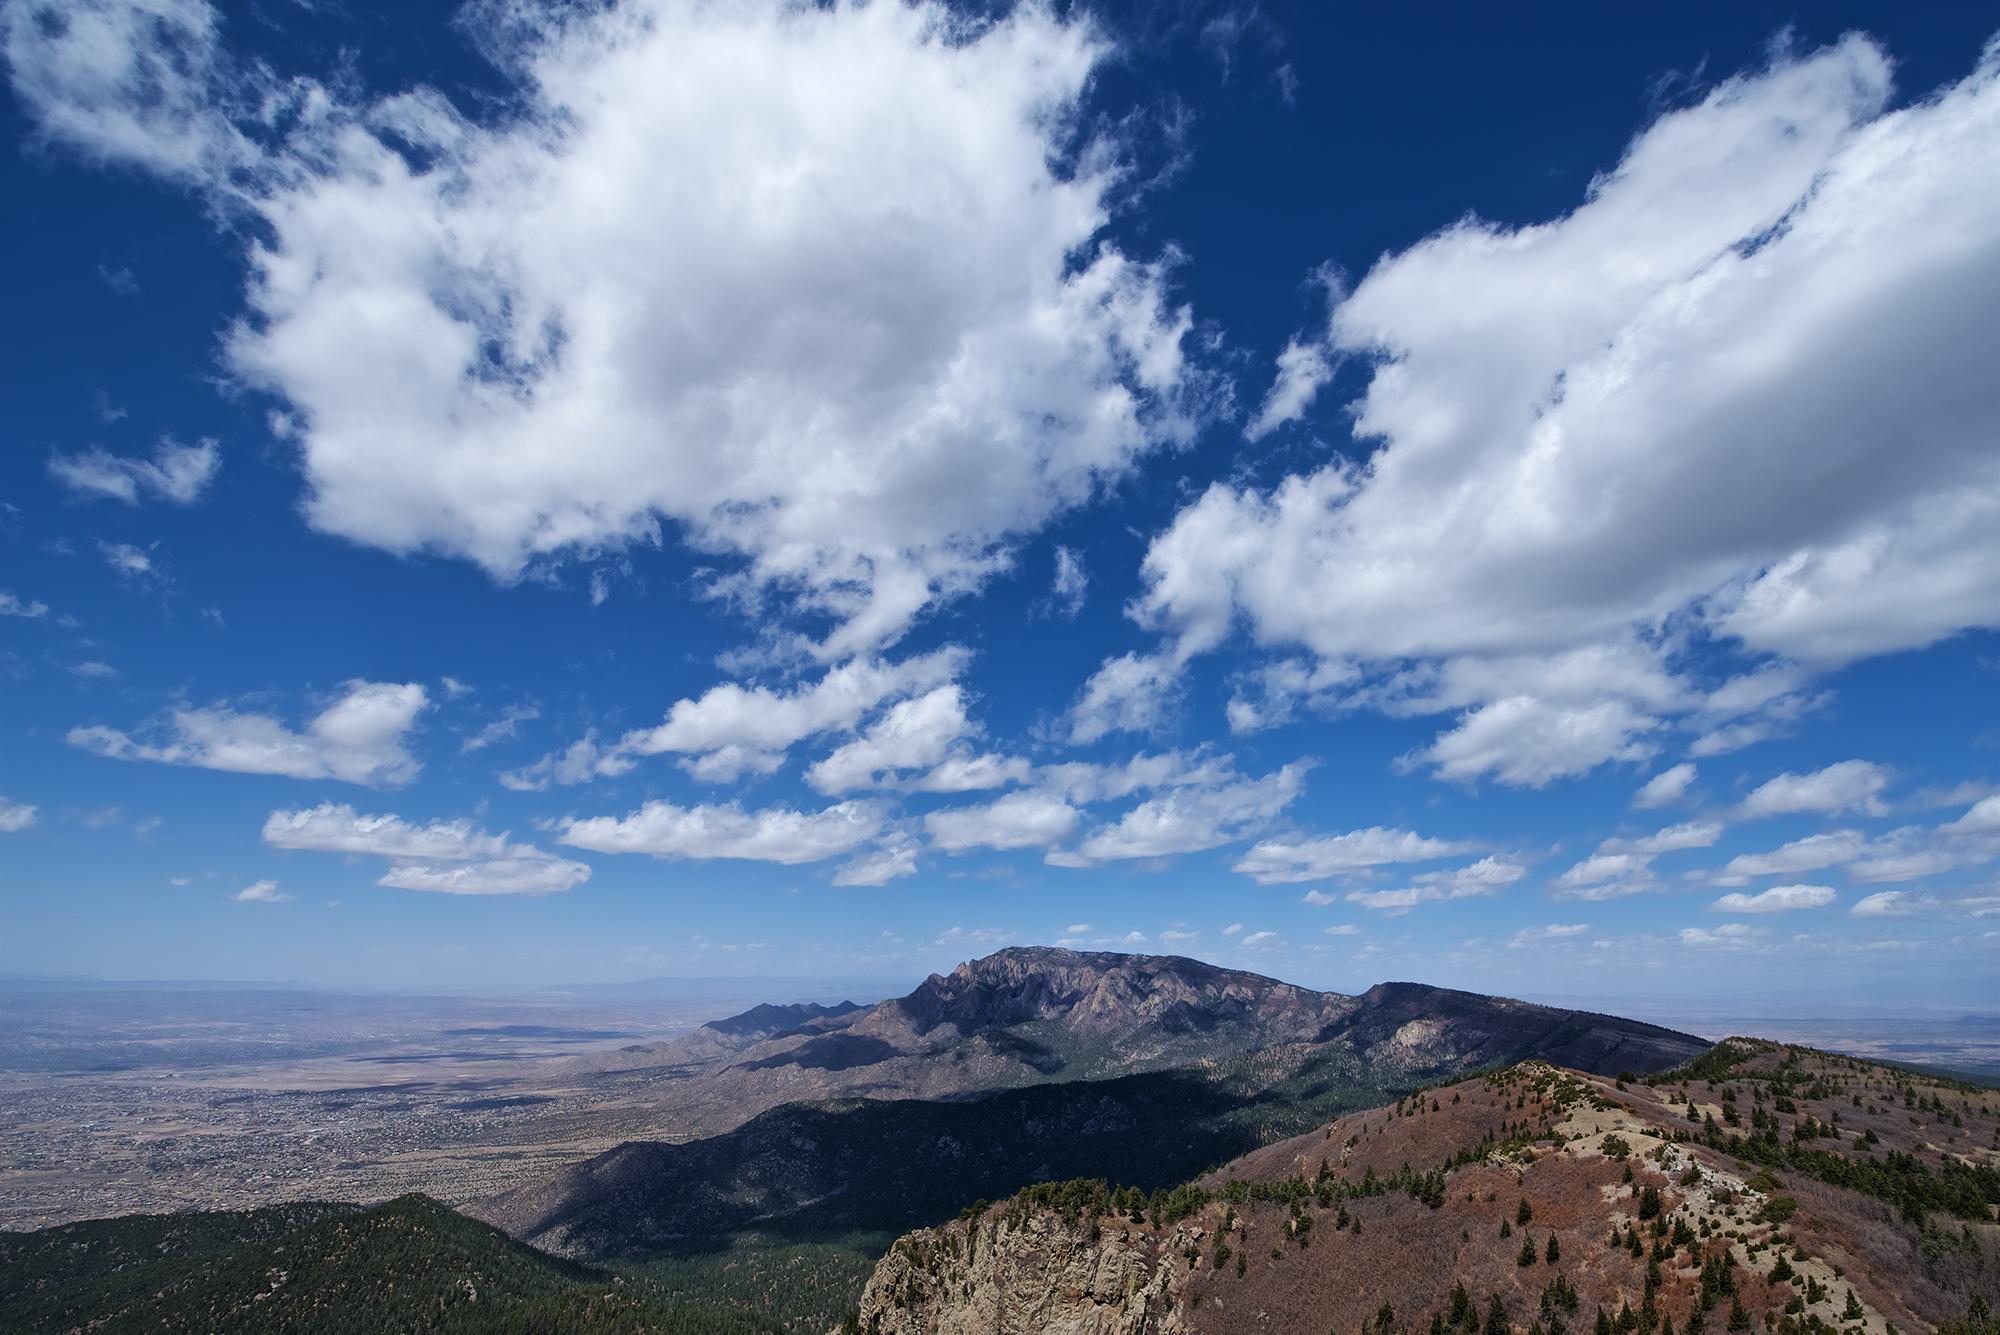 north-sandia-peak-nm-true.jpg